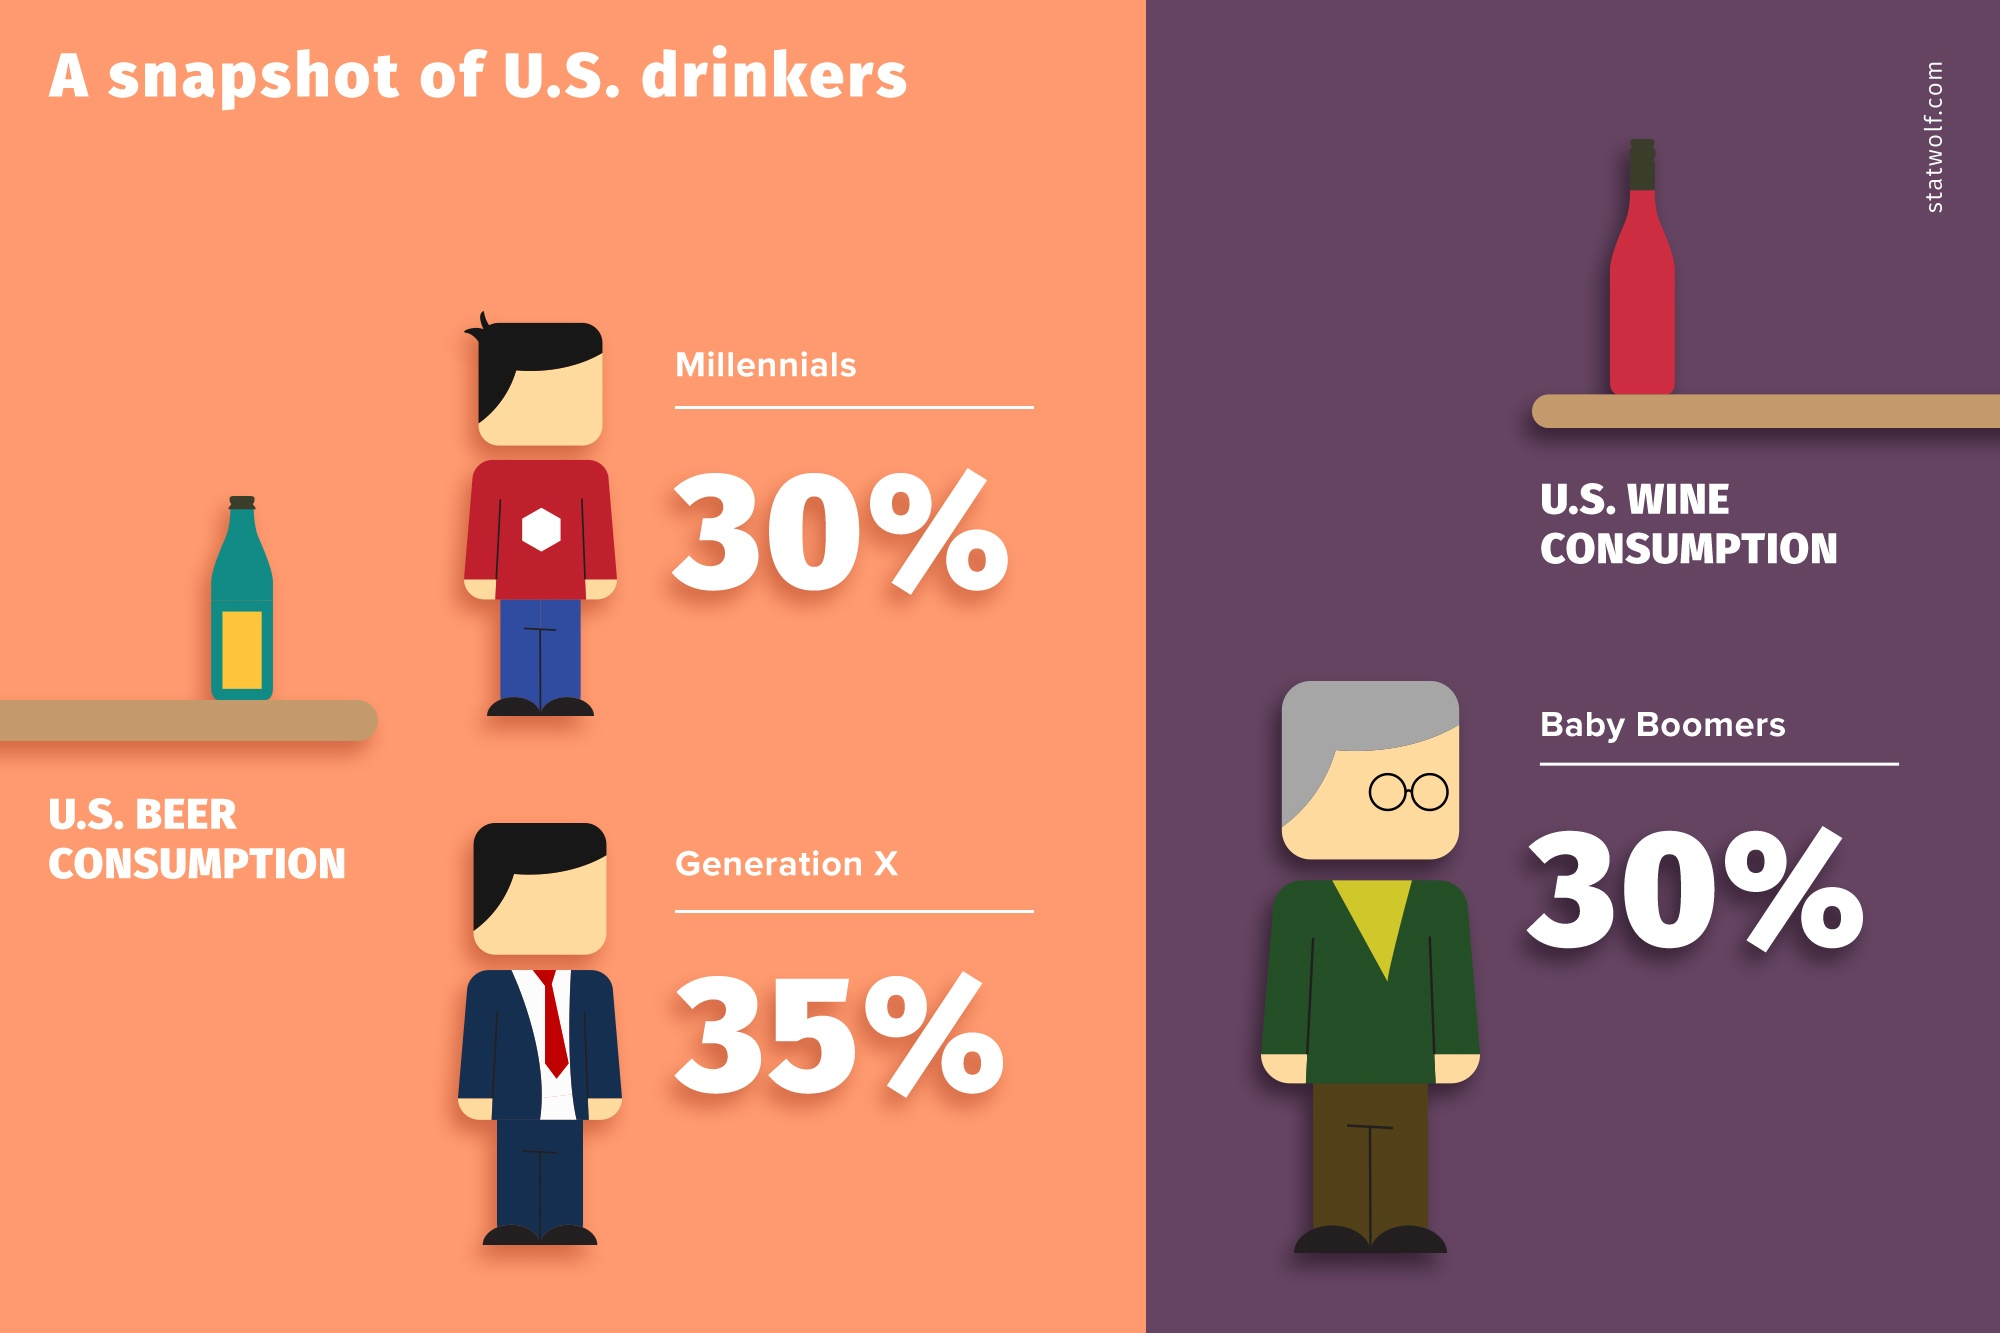 A Snapshot of U.S Drinkers